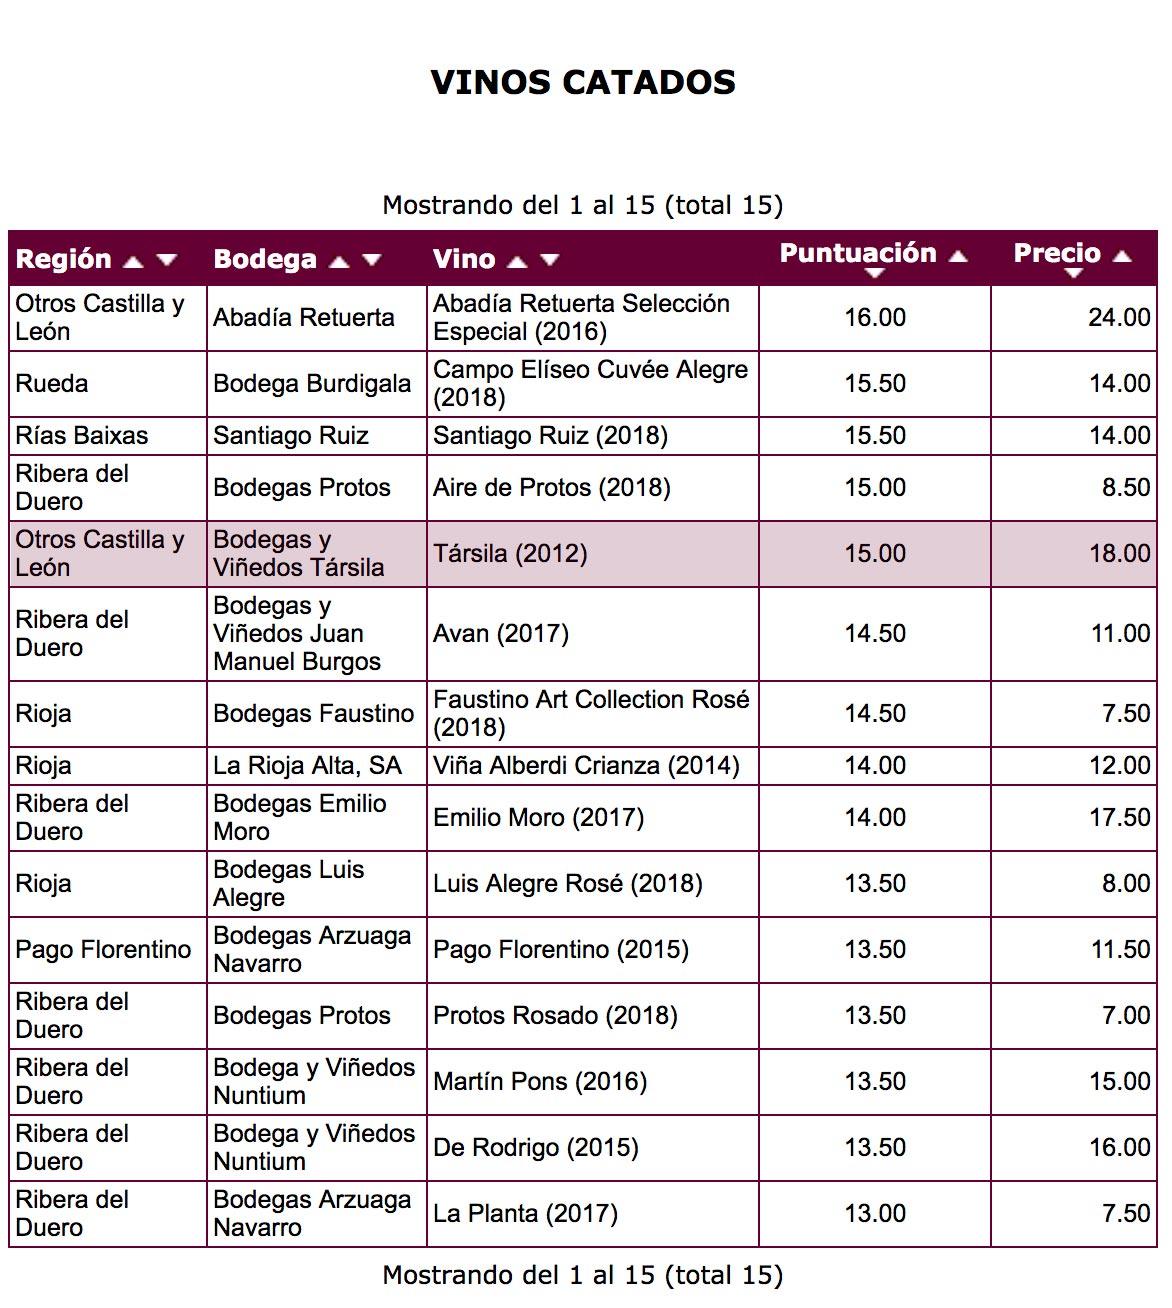 tasting-el-mundo-vino-tarsila-12-months.jpg